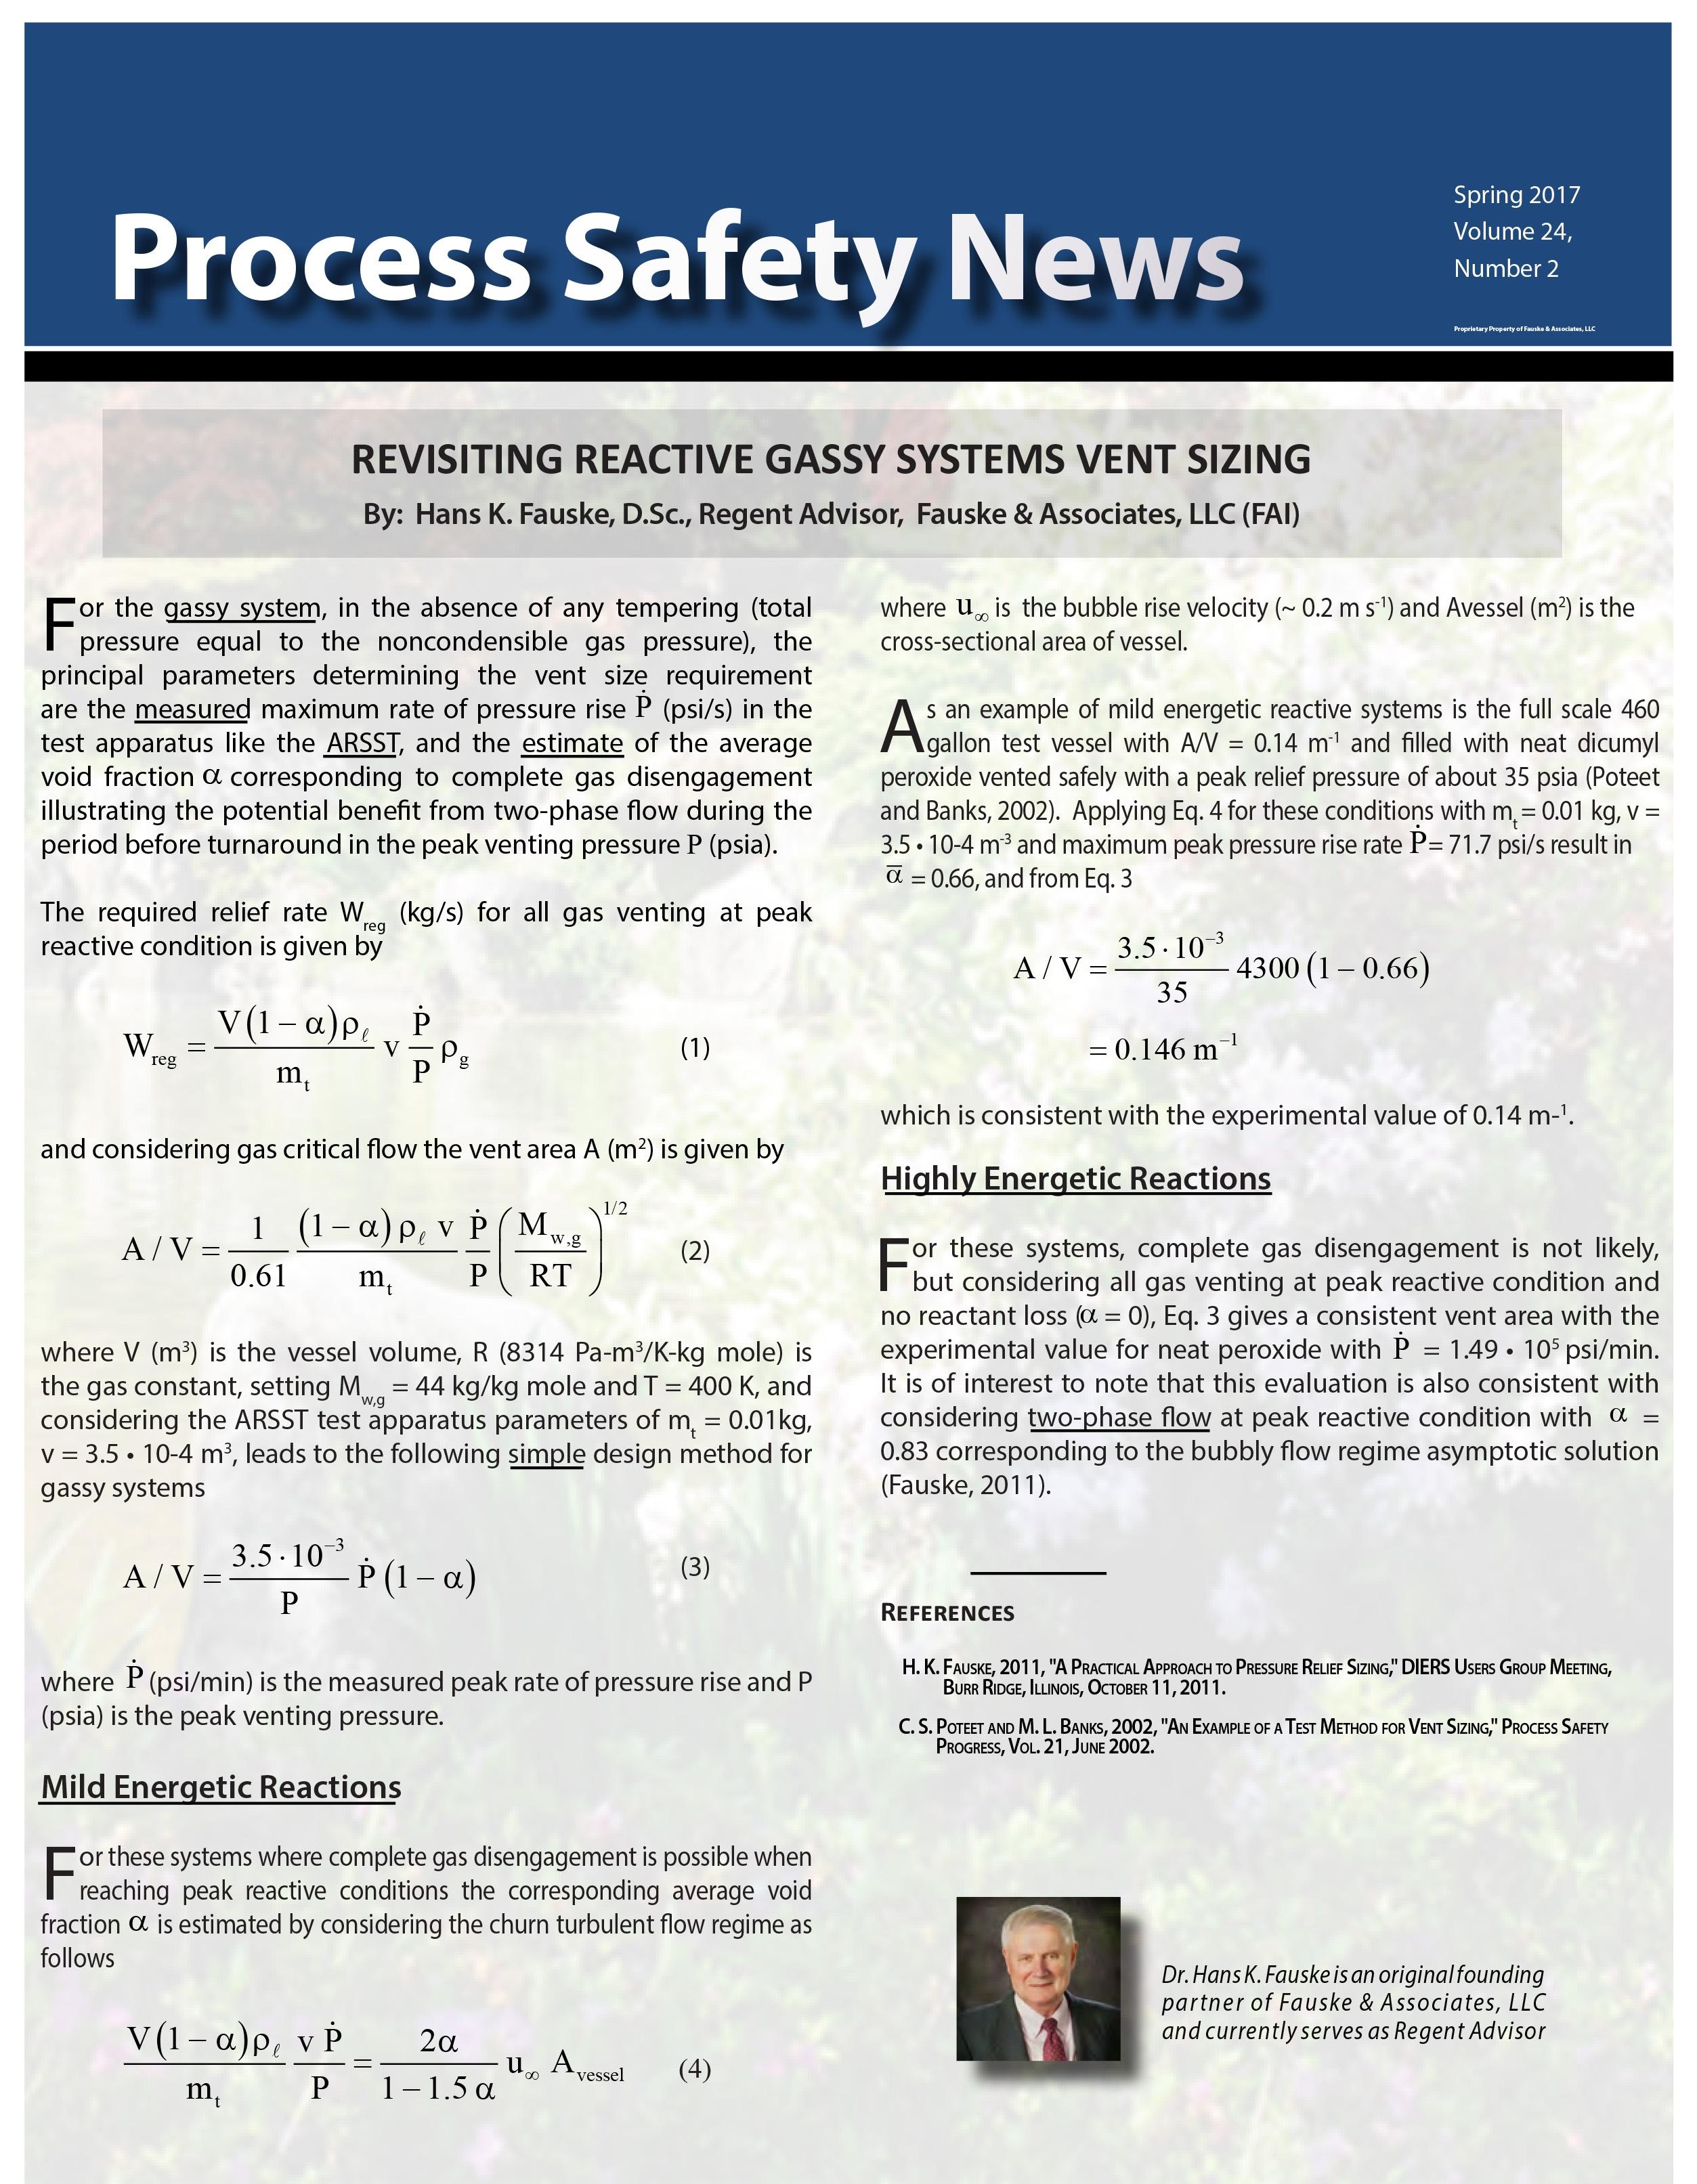 Process Safety News - Spring 2017